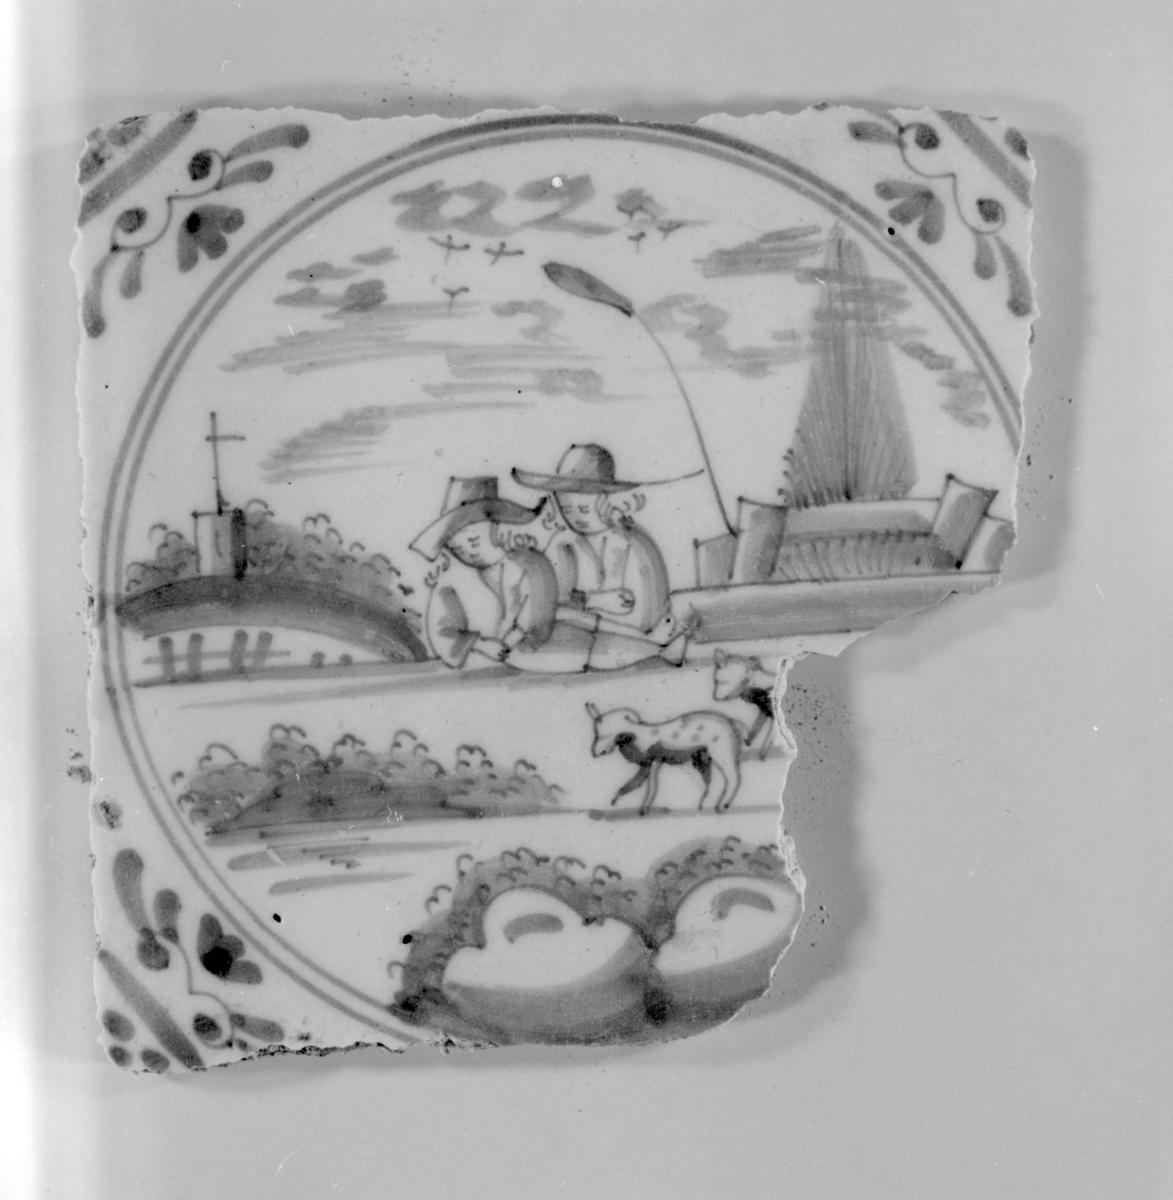 1036 - Keramikkflis med dekor